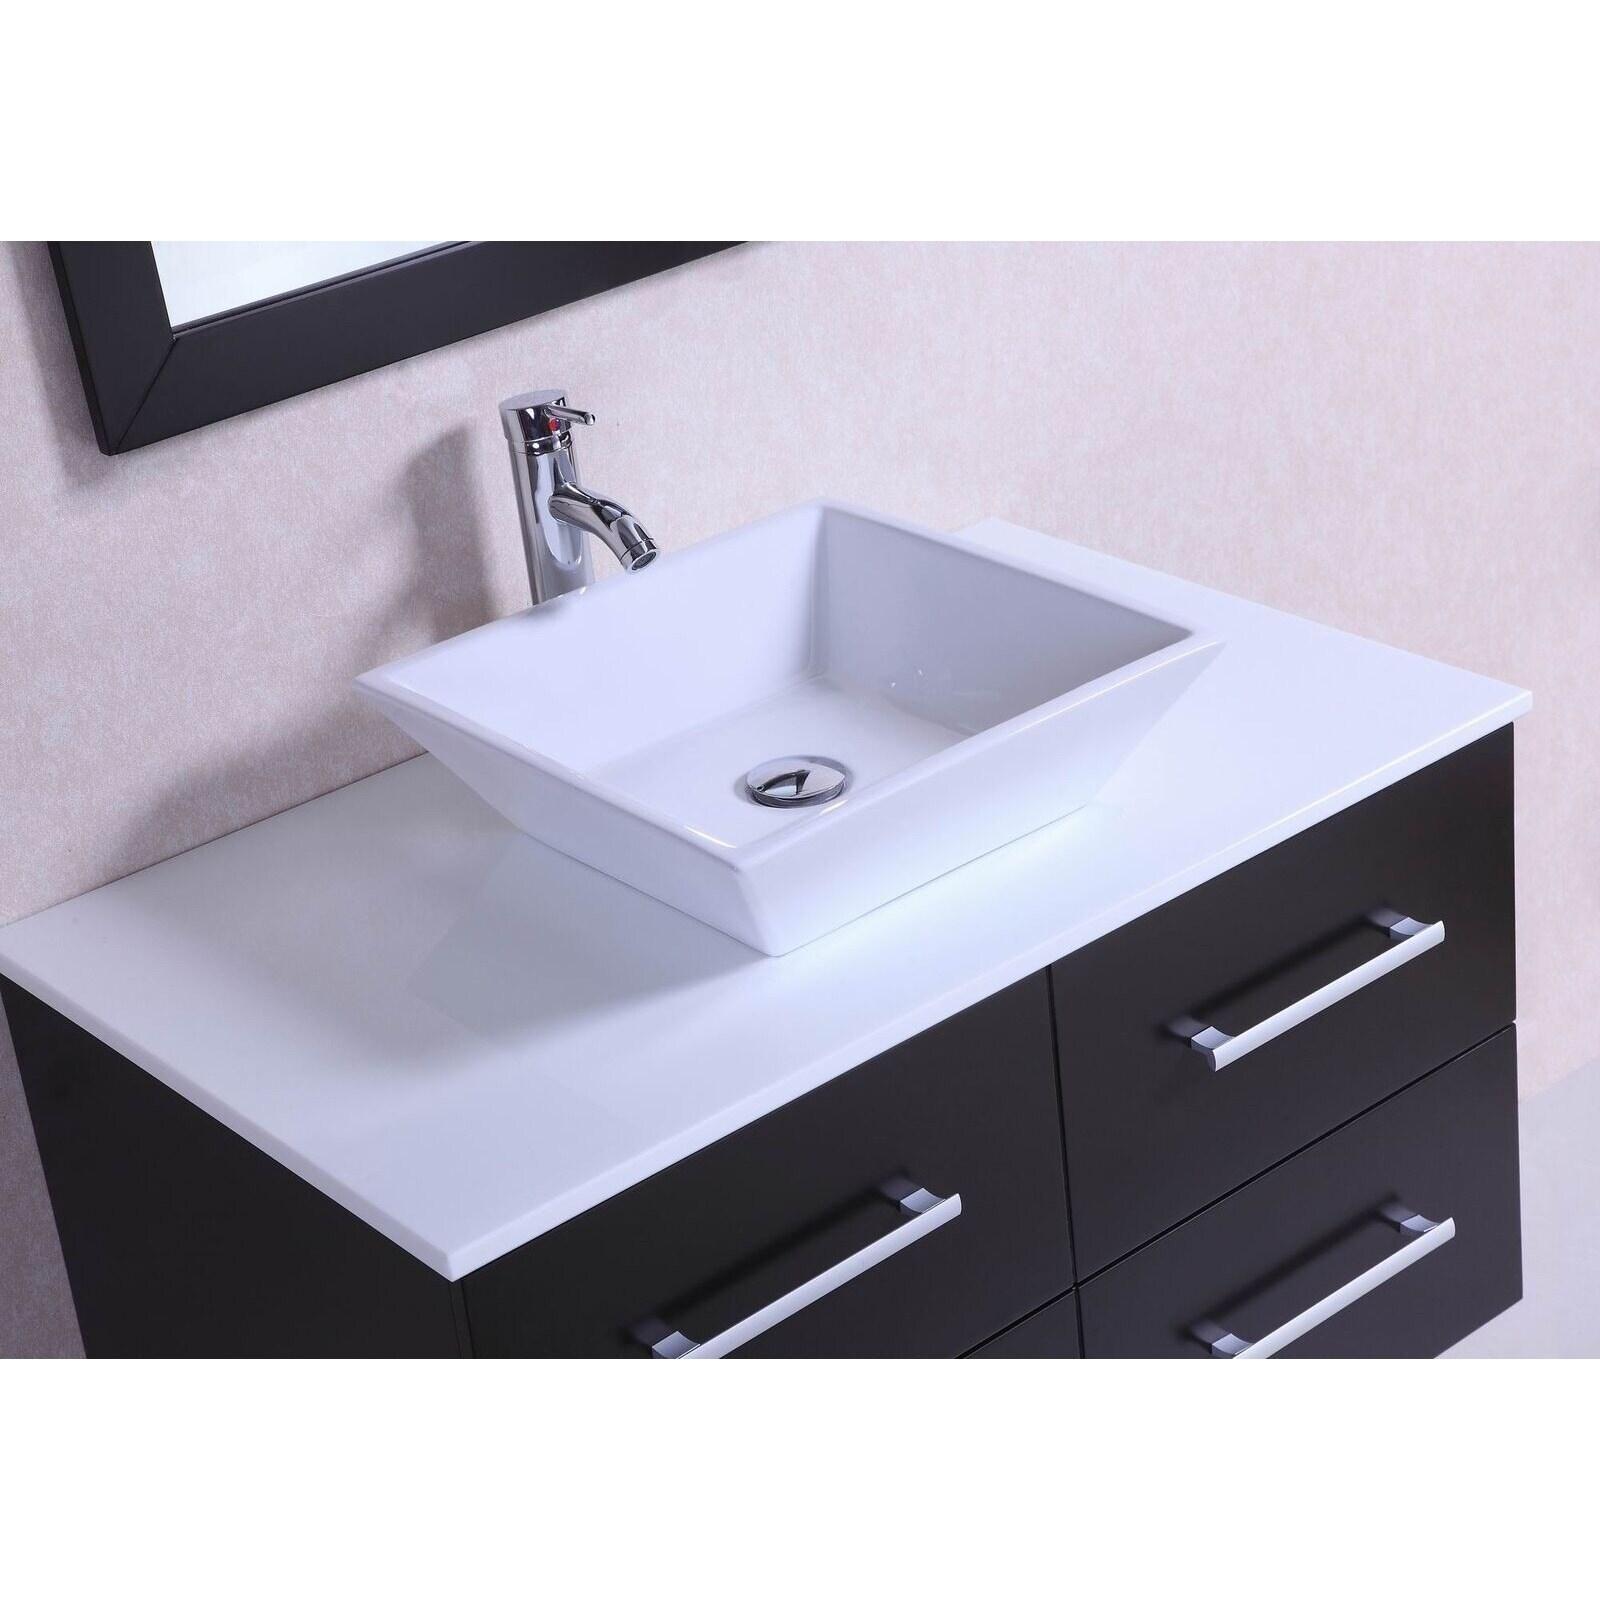 36-inch Belvedere Modern Wall Mounted Espresso Bathroom Vanity ...